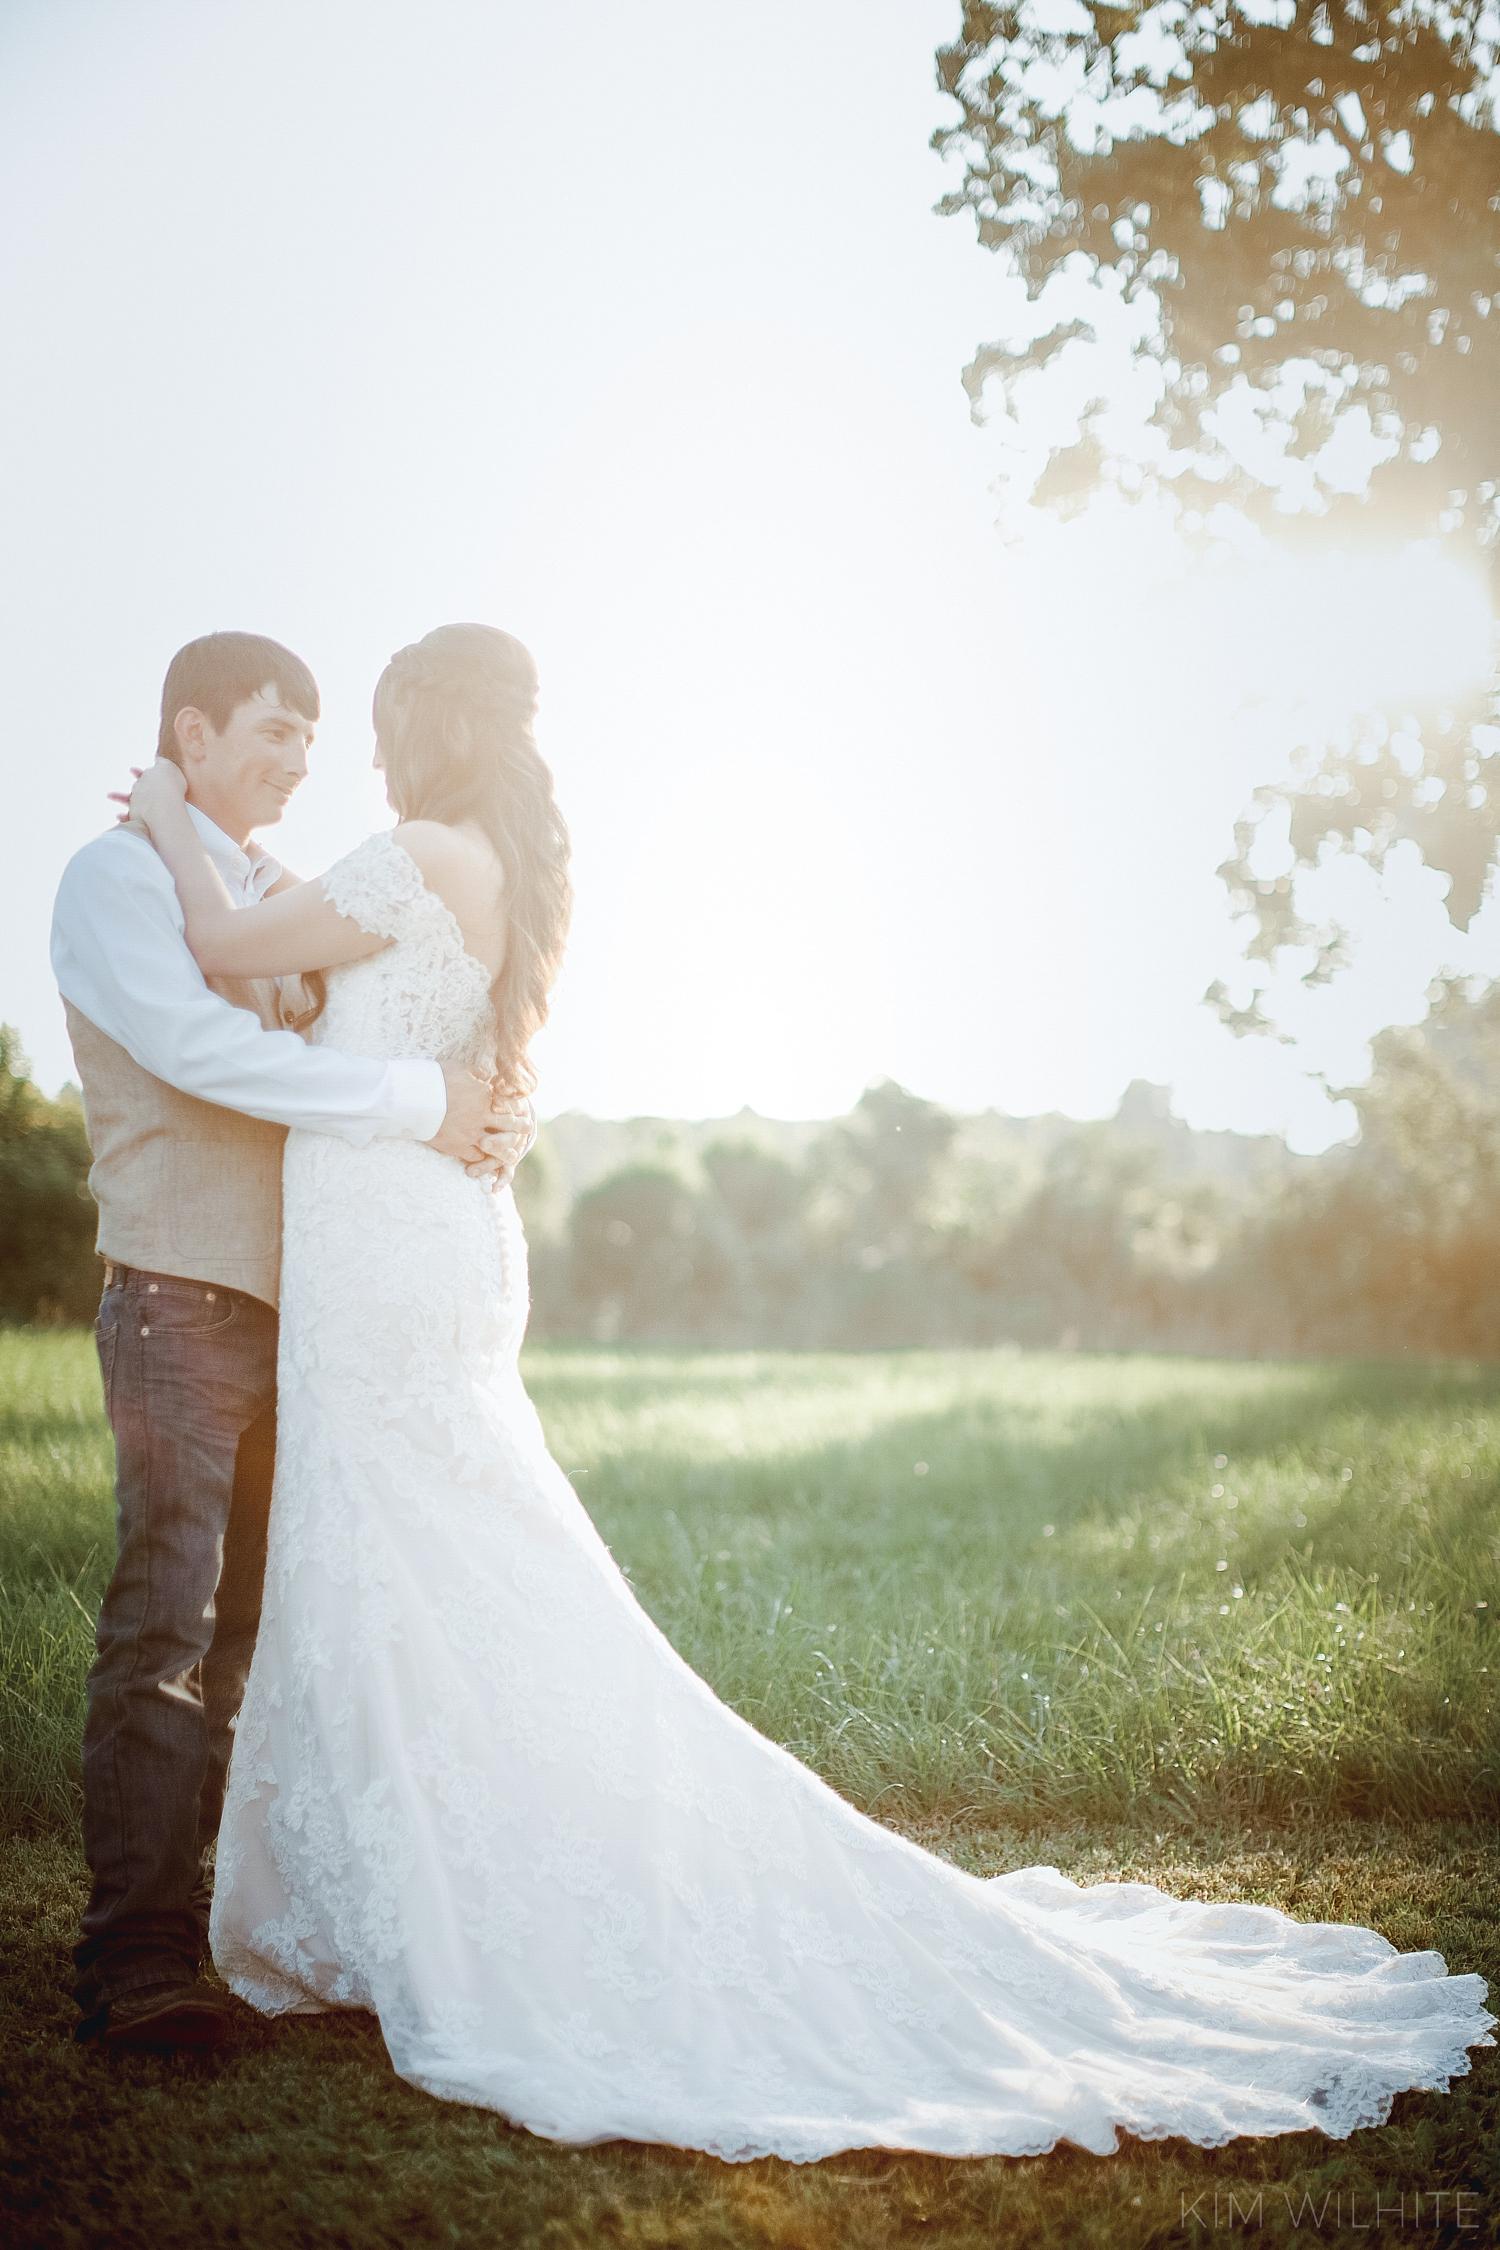 The Meadow Wedding Barn Bride and Groom